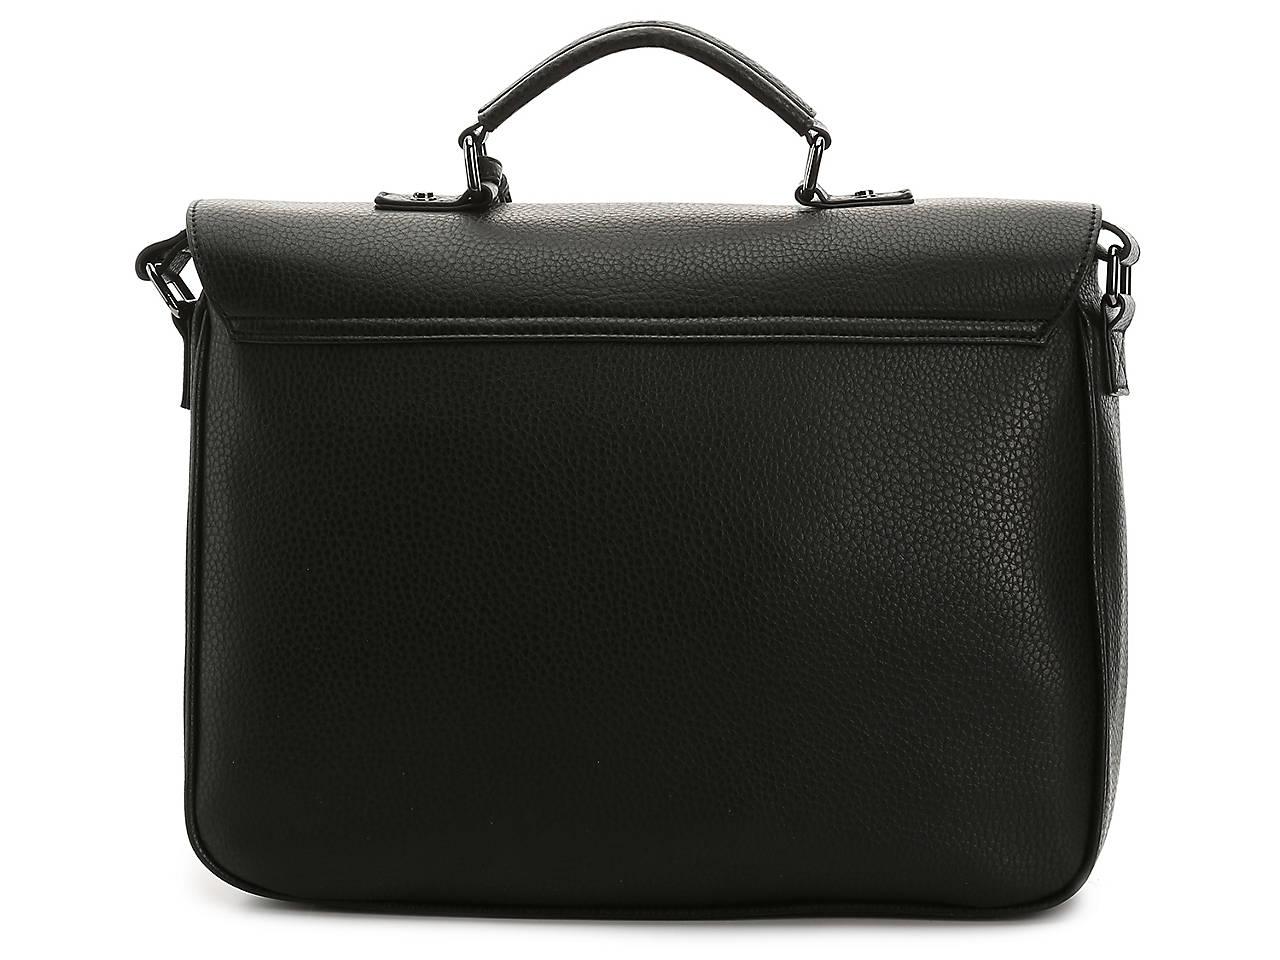 d32d0e9c183 Aldo Norman Messenger Bag Men's Handbags & Accessories | DSW